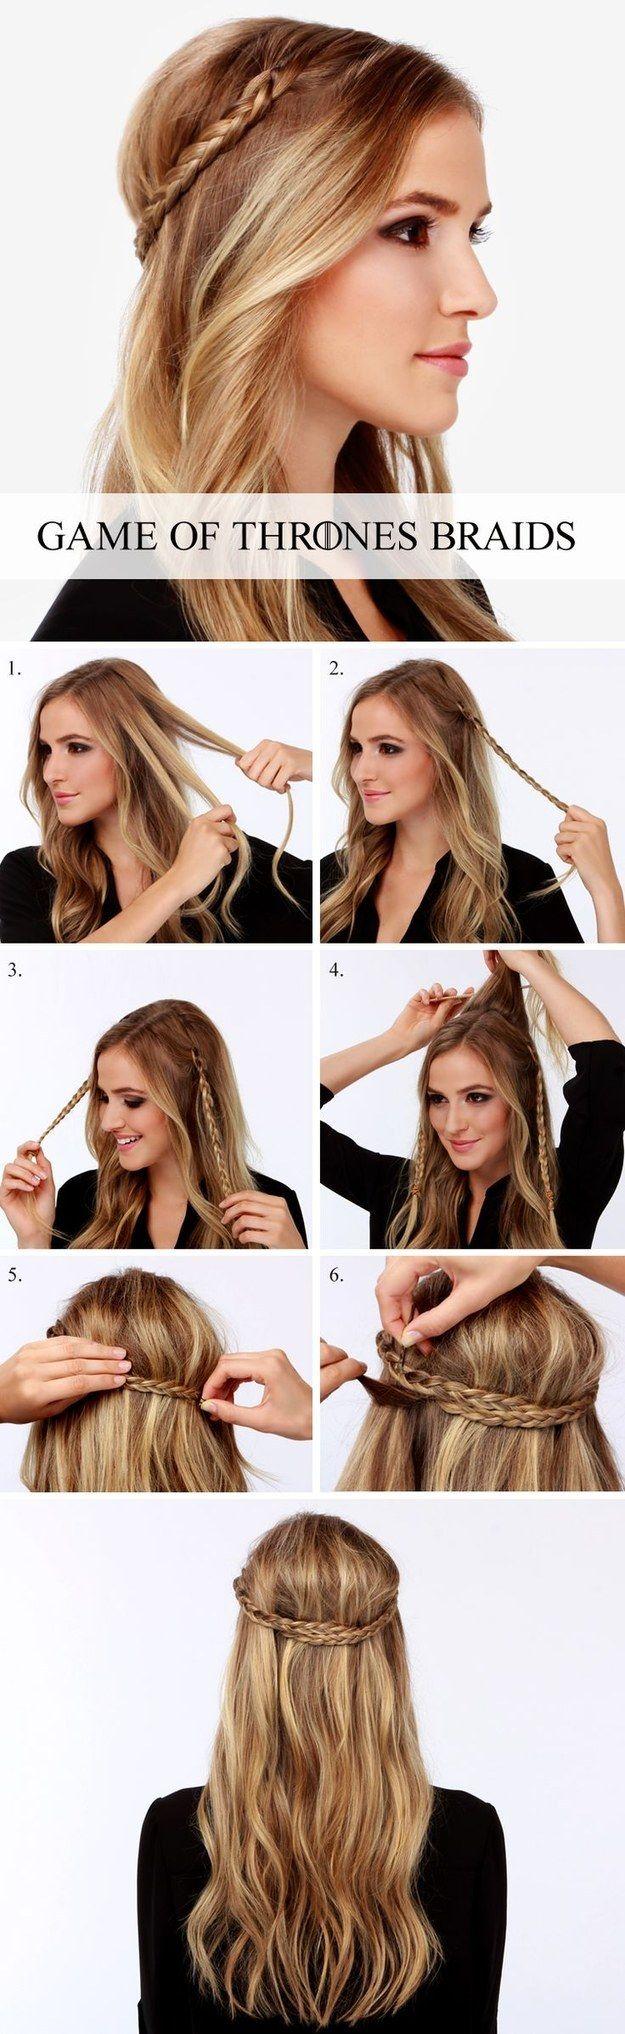 Alex tried this pinterest hair braid tutorials and real women